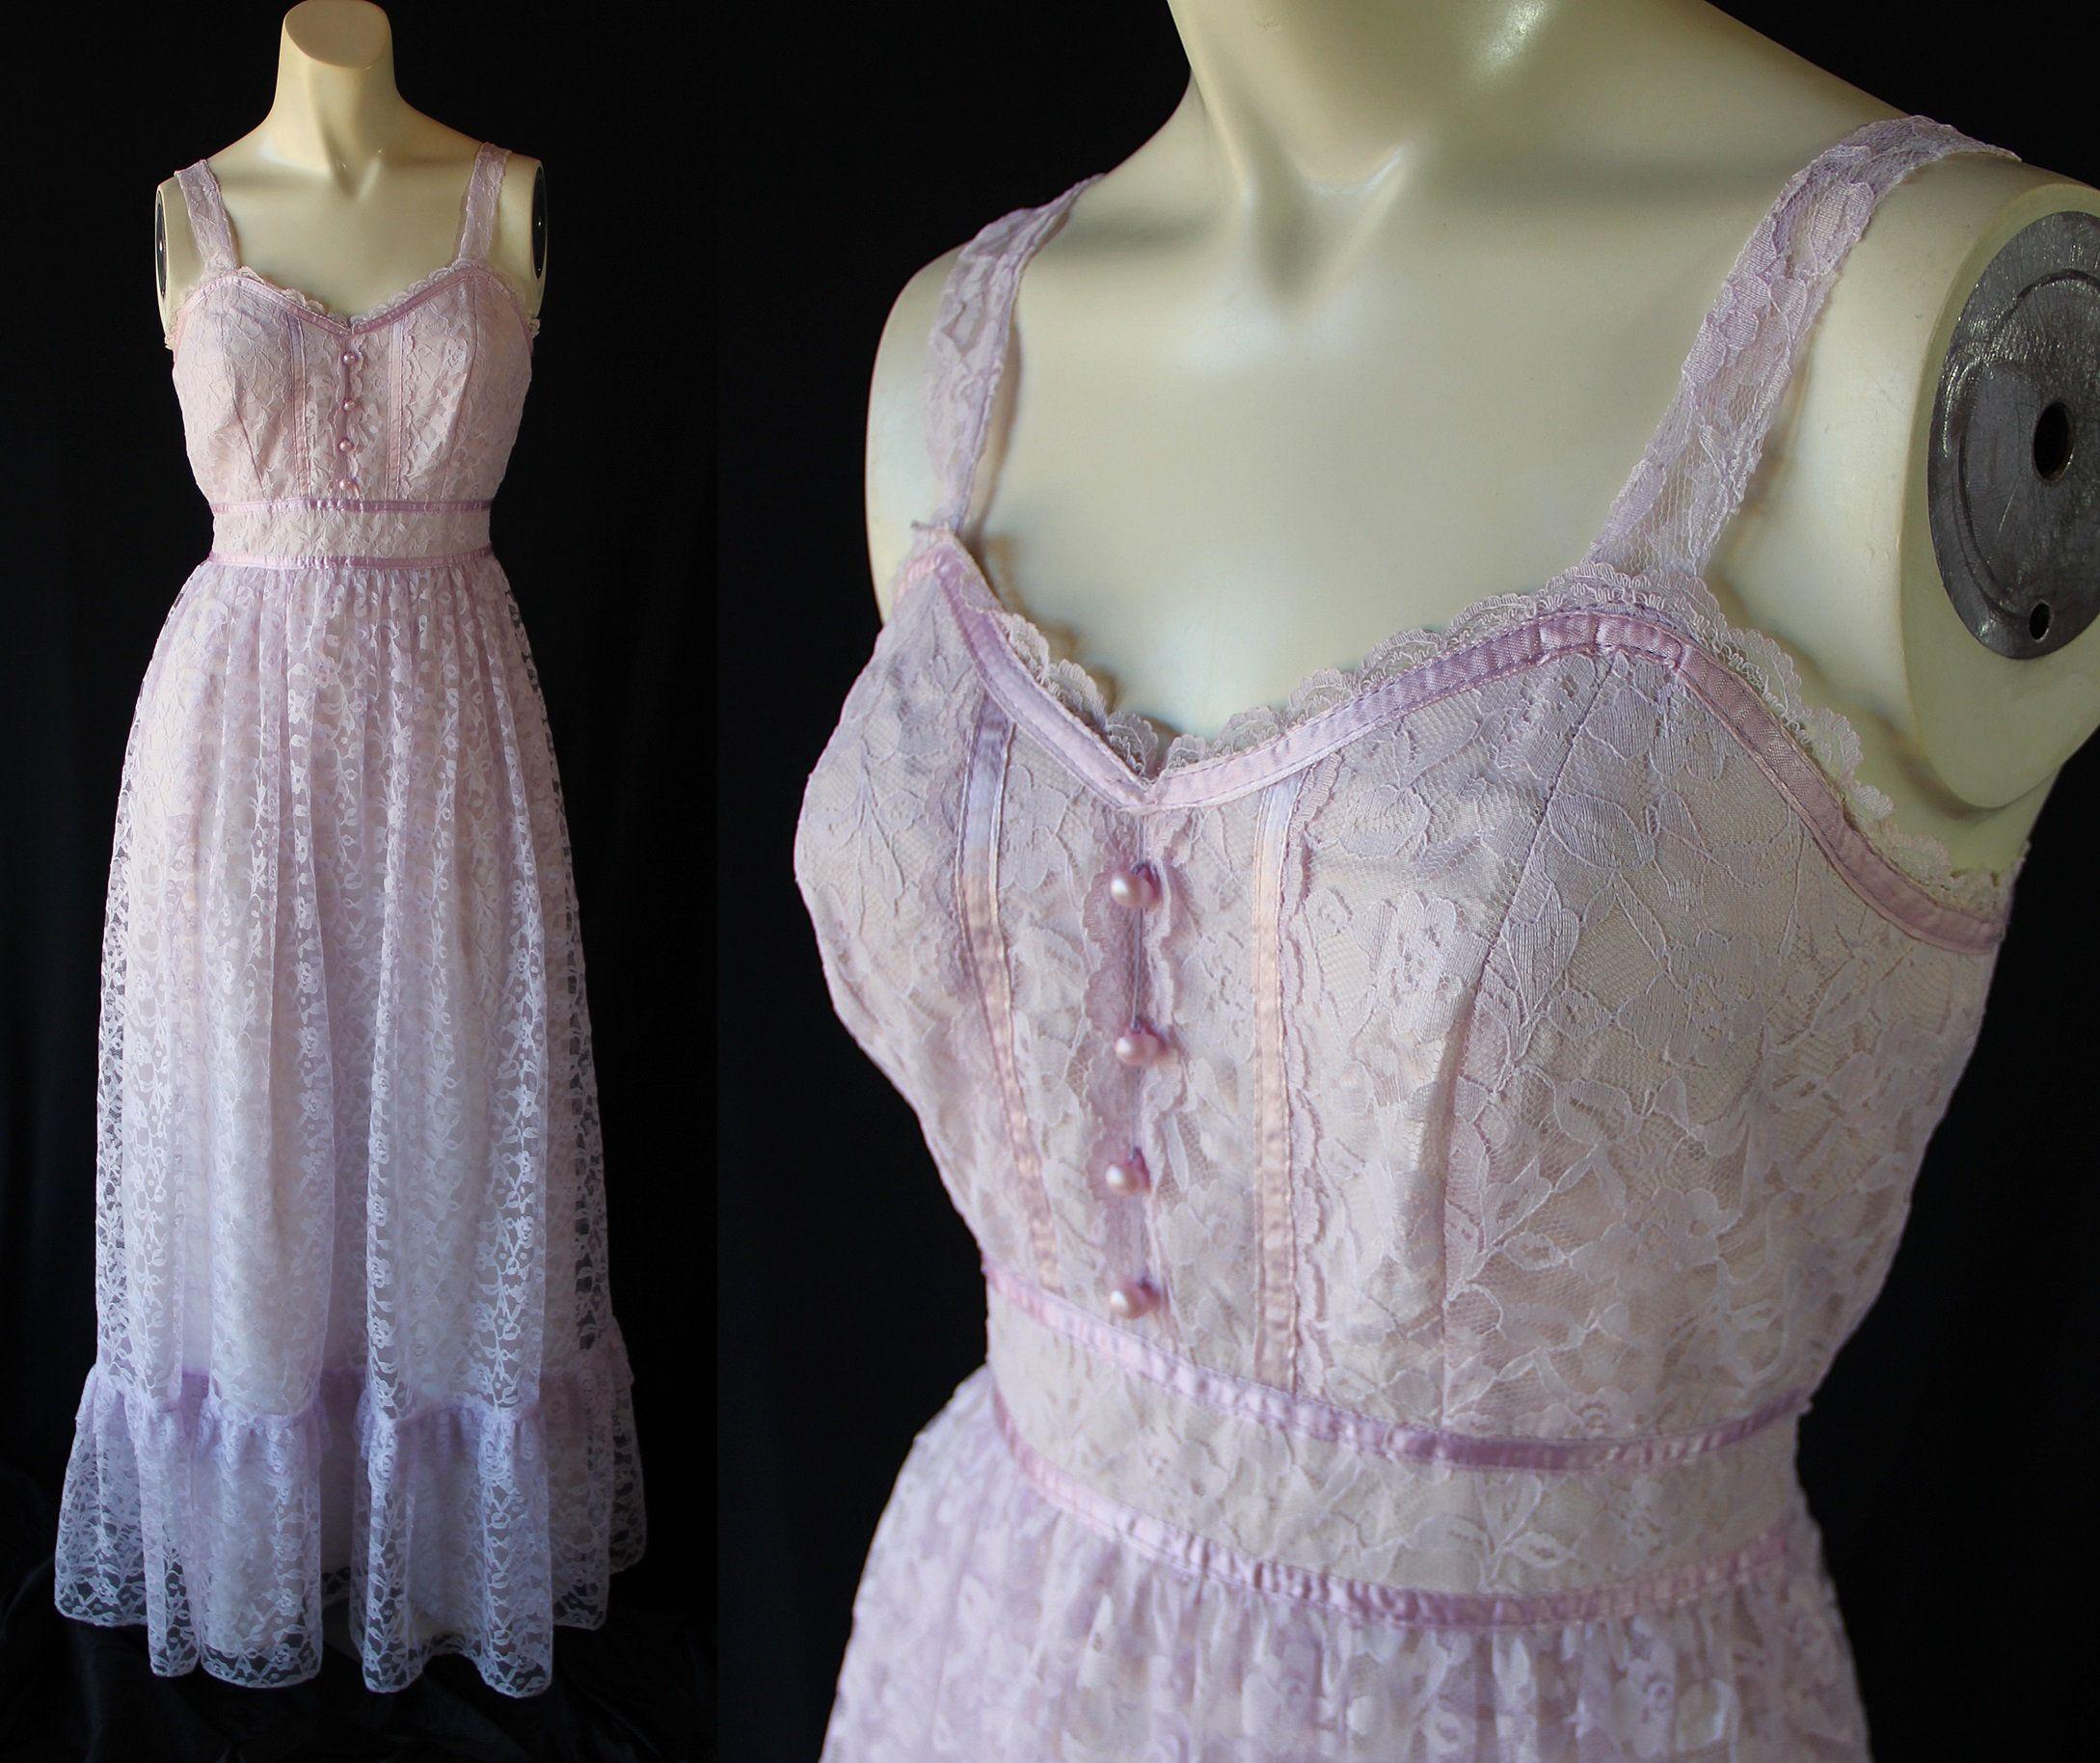 70s 80s Prom Dress Lilac Lace Vintage Wedding Boho Etsy Lilac Prom Dresses 80s Prom Dress Prom Dresses [ 1828 x 2178 Pixel ]